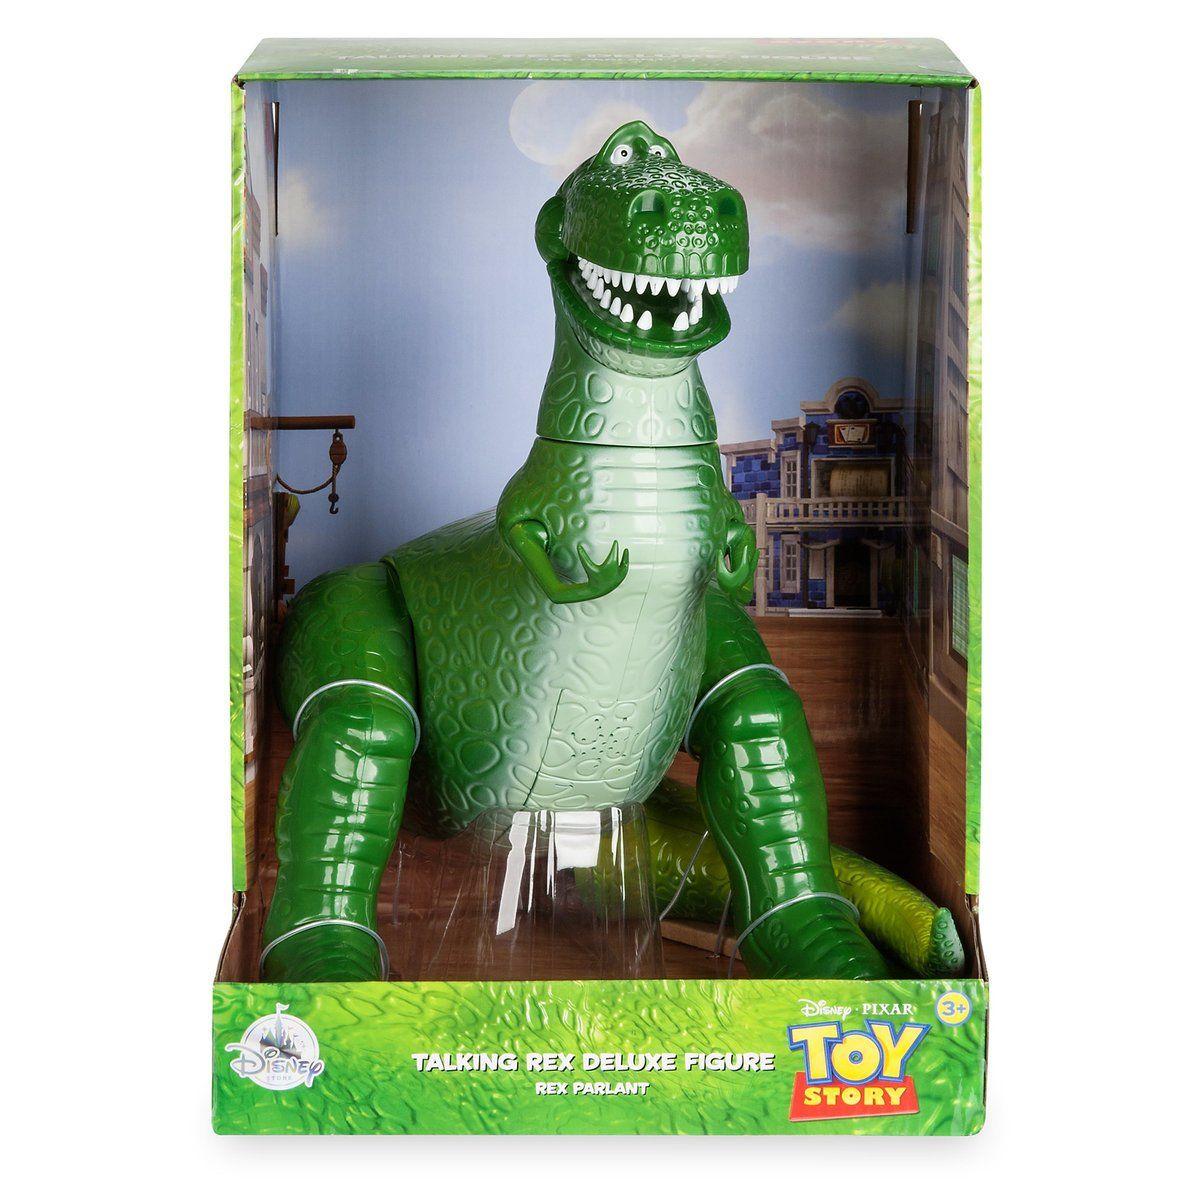 Disney Toy Story 3 Collection Talking REX Dinosaur 11 Phrases 12 Disney  Store 38664f81668